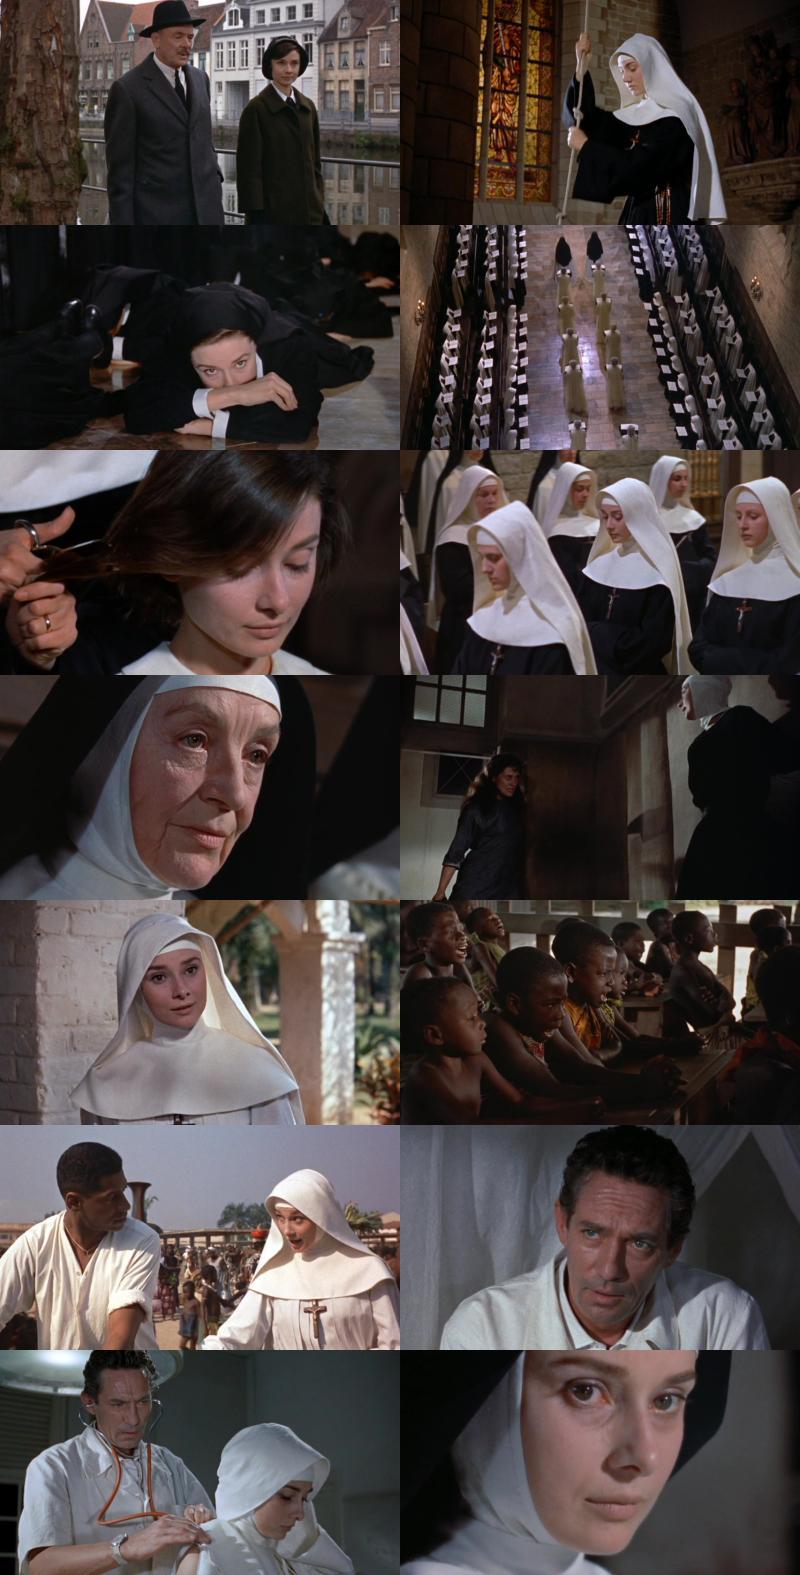 http://watershade.net/public/nuns-story.jpg